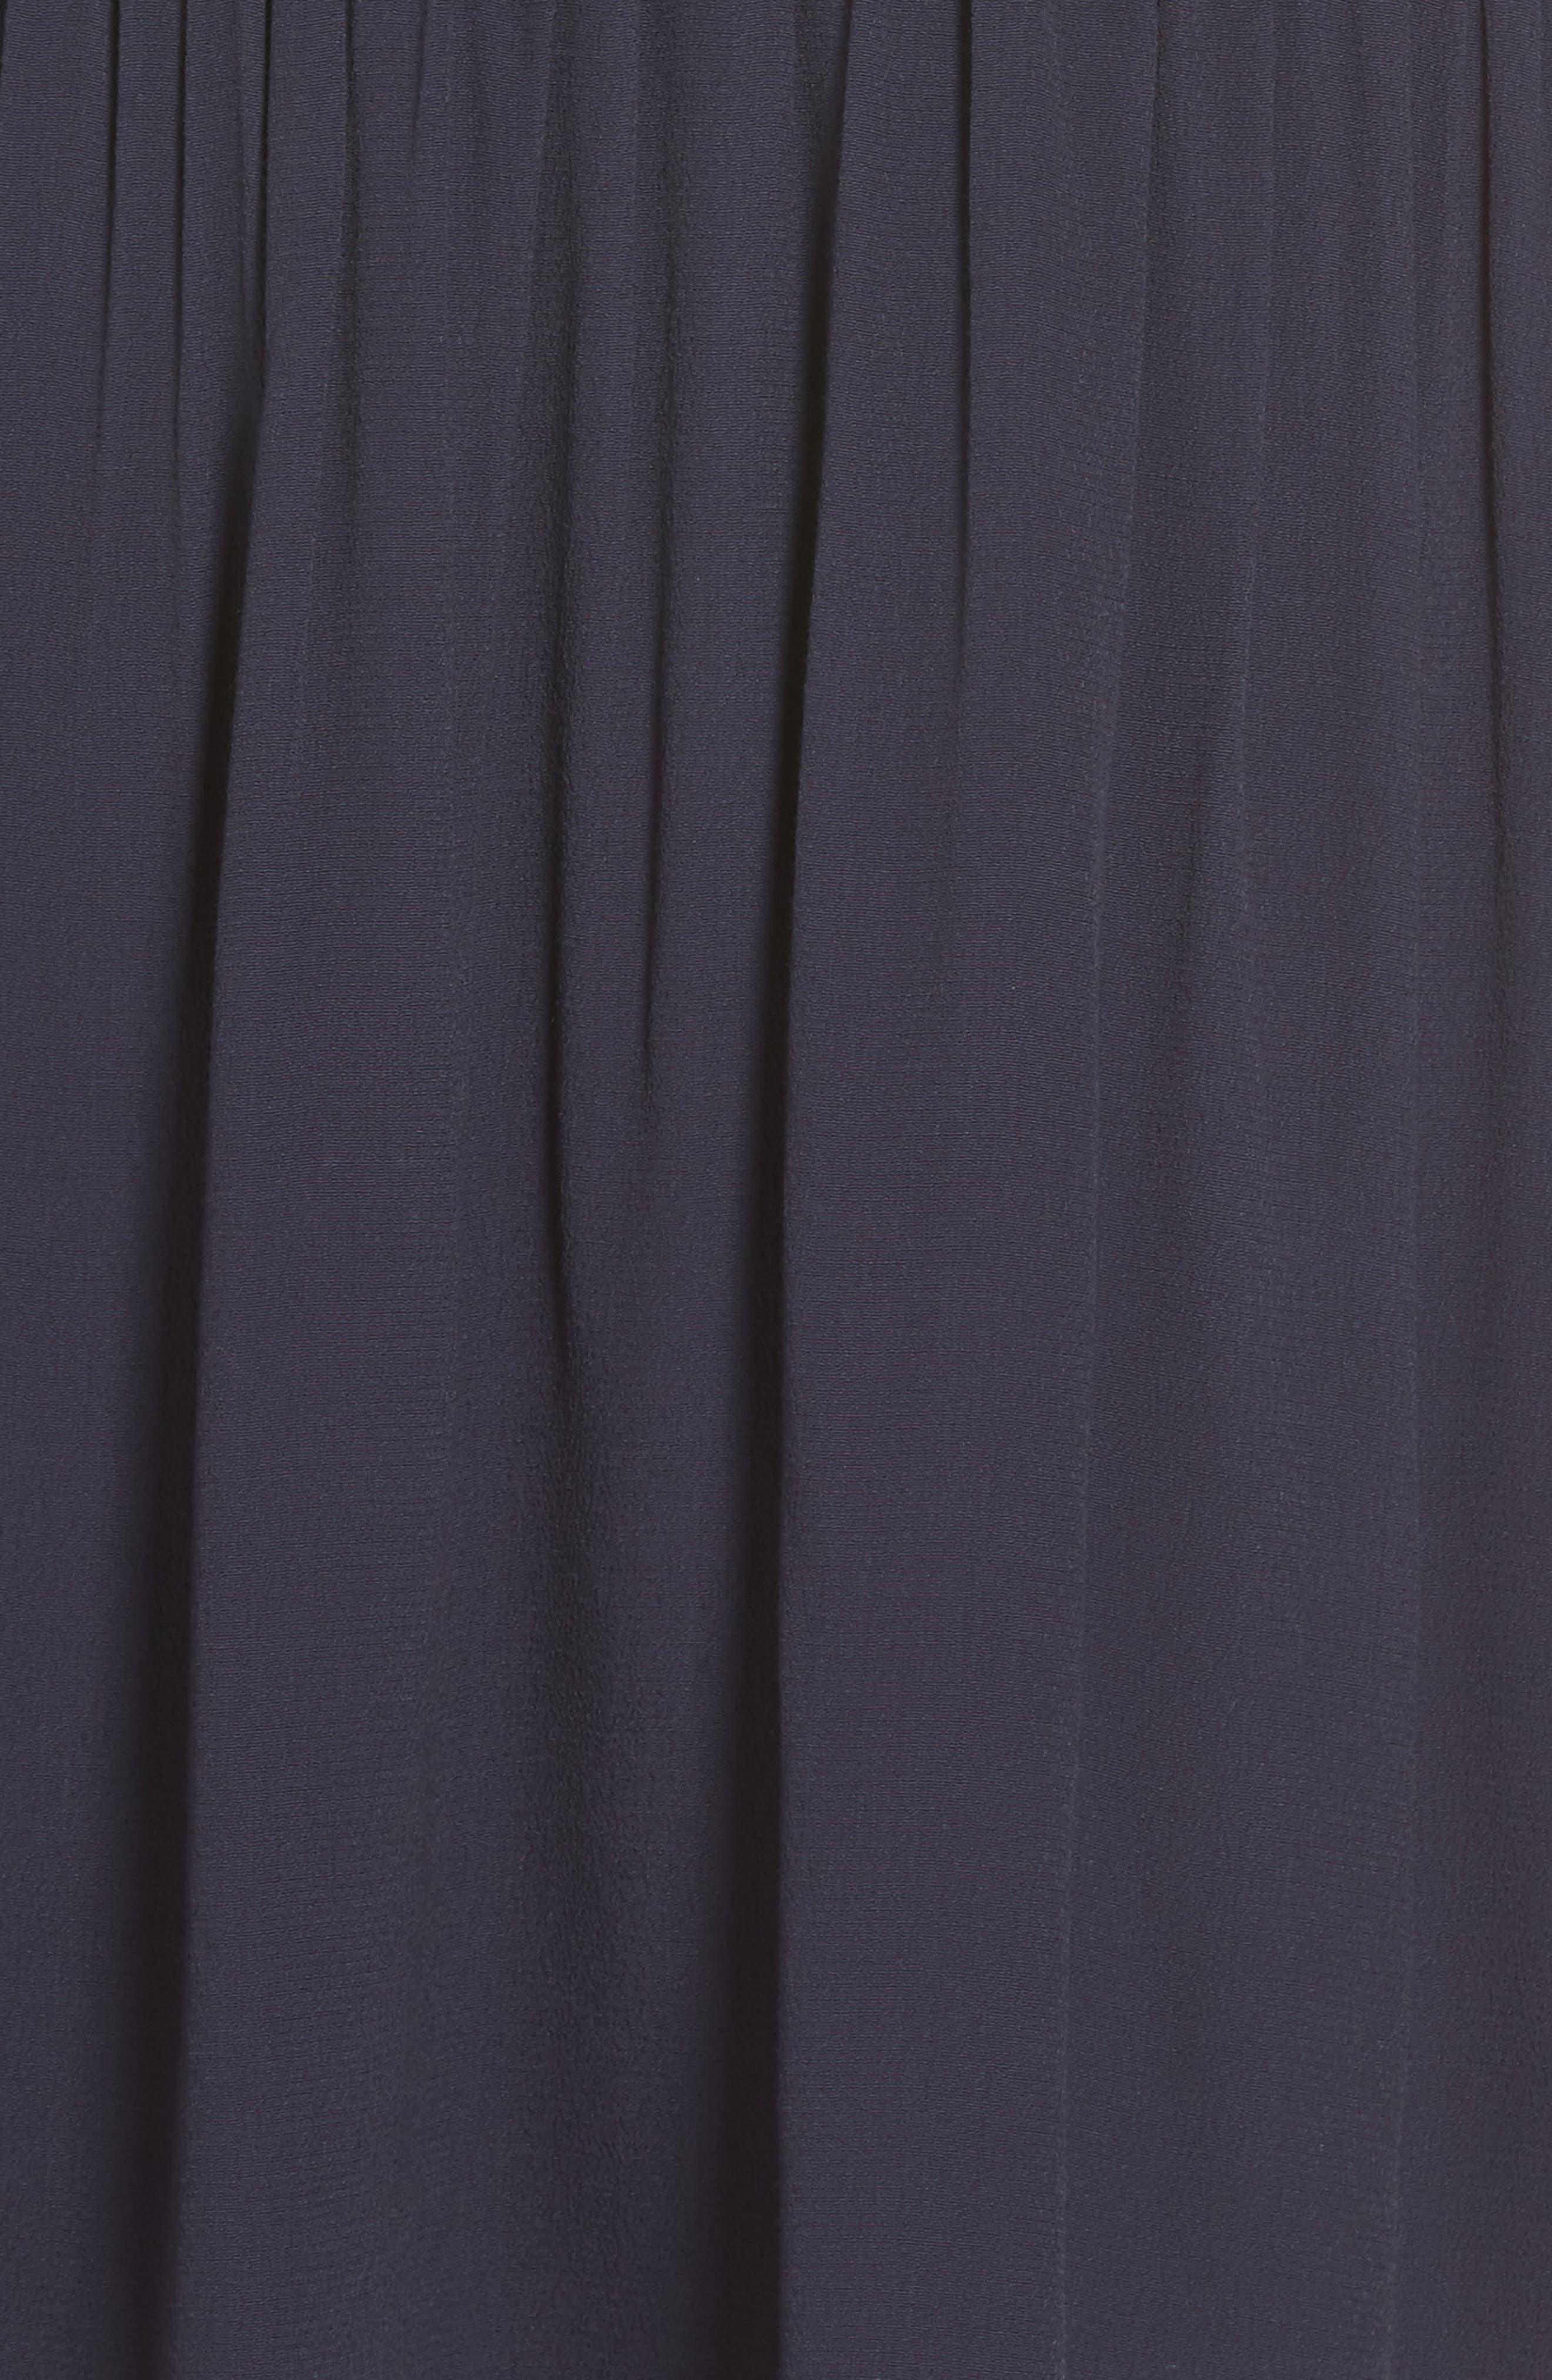 Melinda Blouson Dress,                             Alternate thumbnail 9, color,